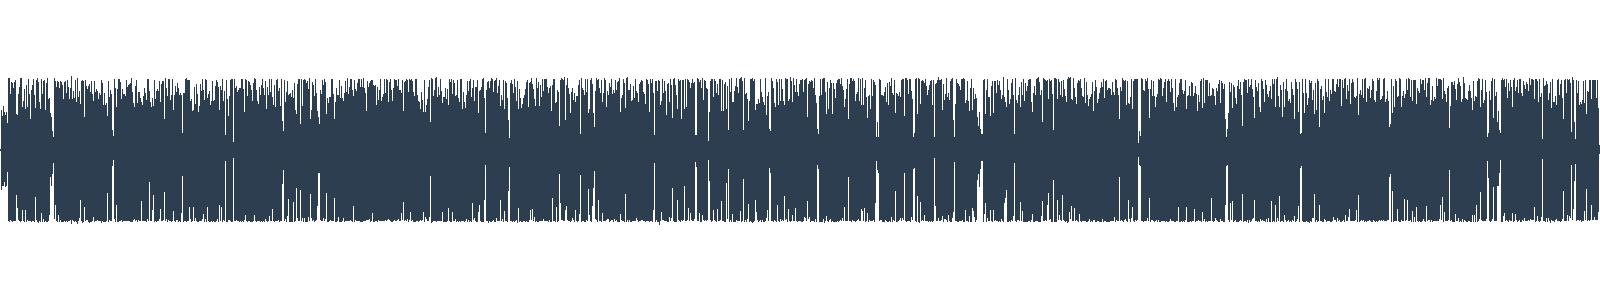 (11) WESTech Myš Logitech MX Vertical pre každú ruku! waveform